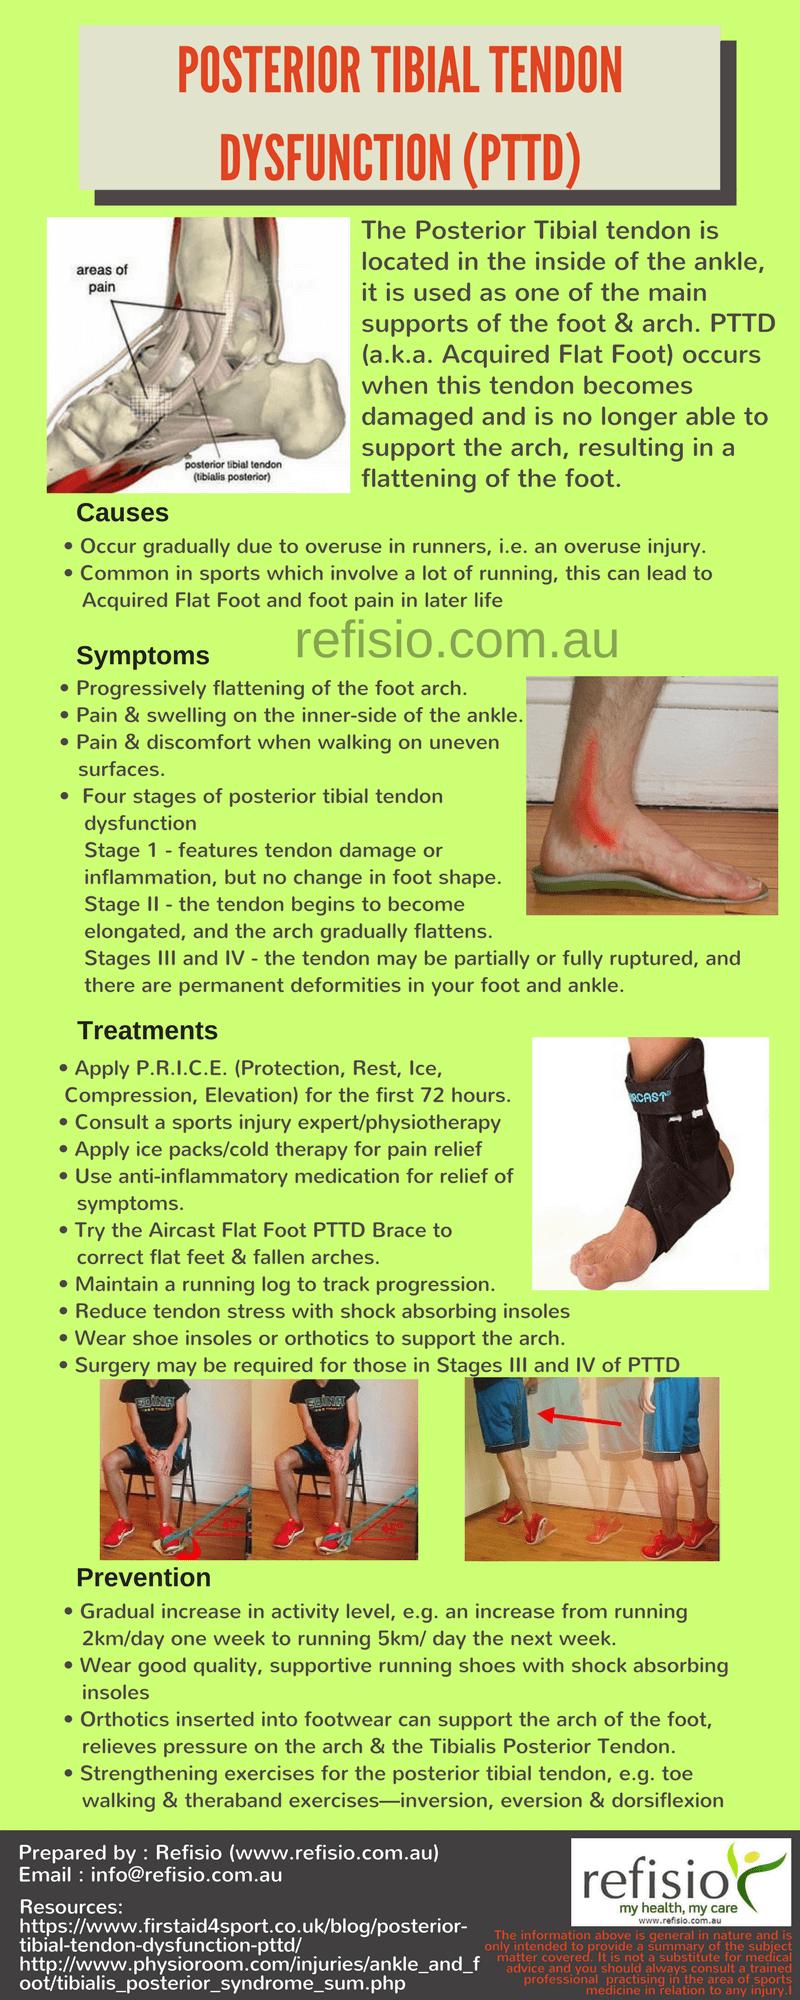 Blog Refisio Athletic training sports medicine